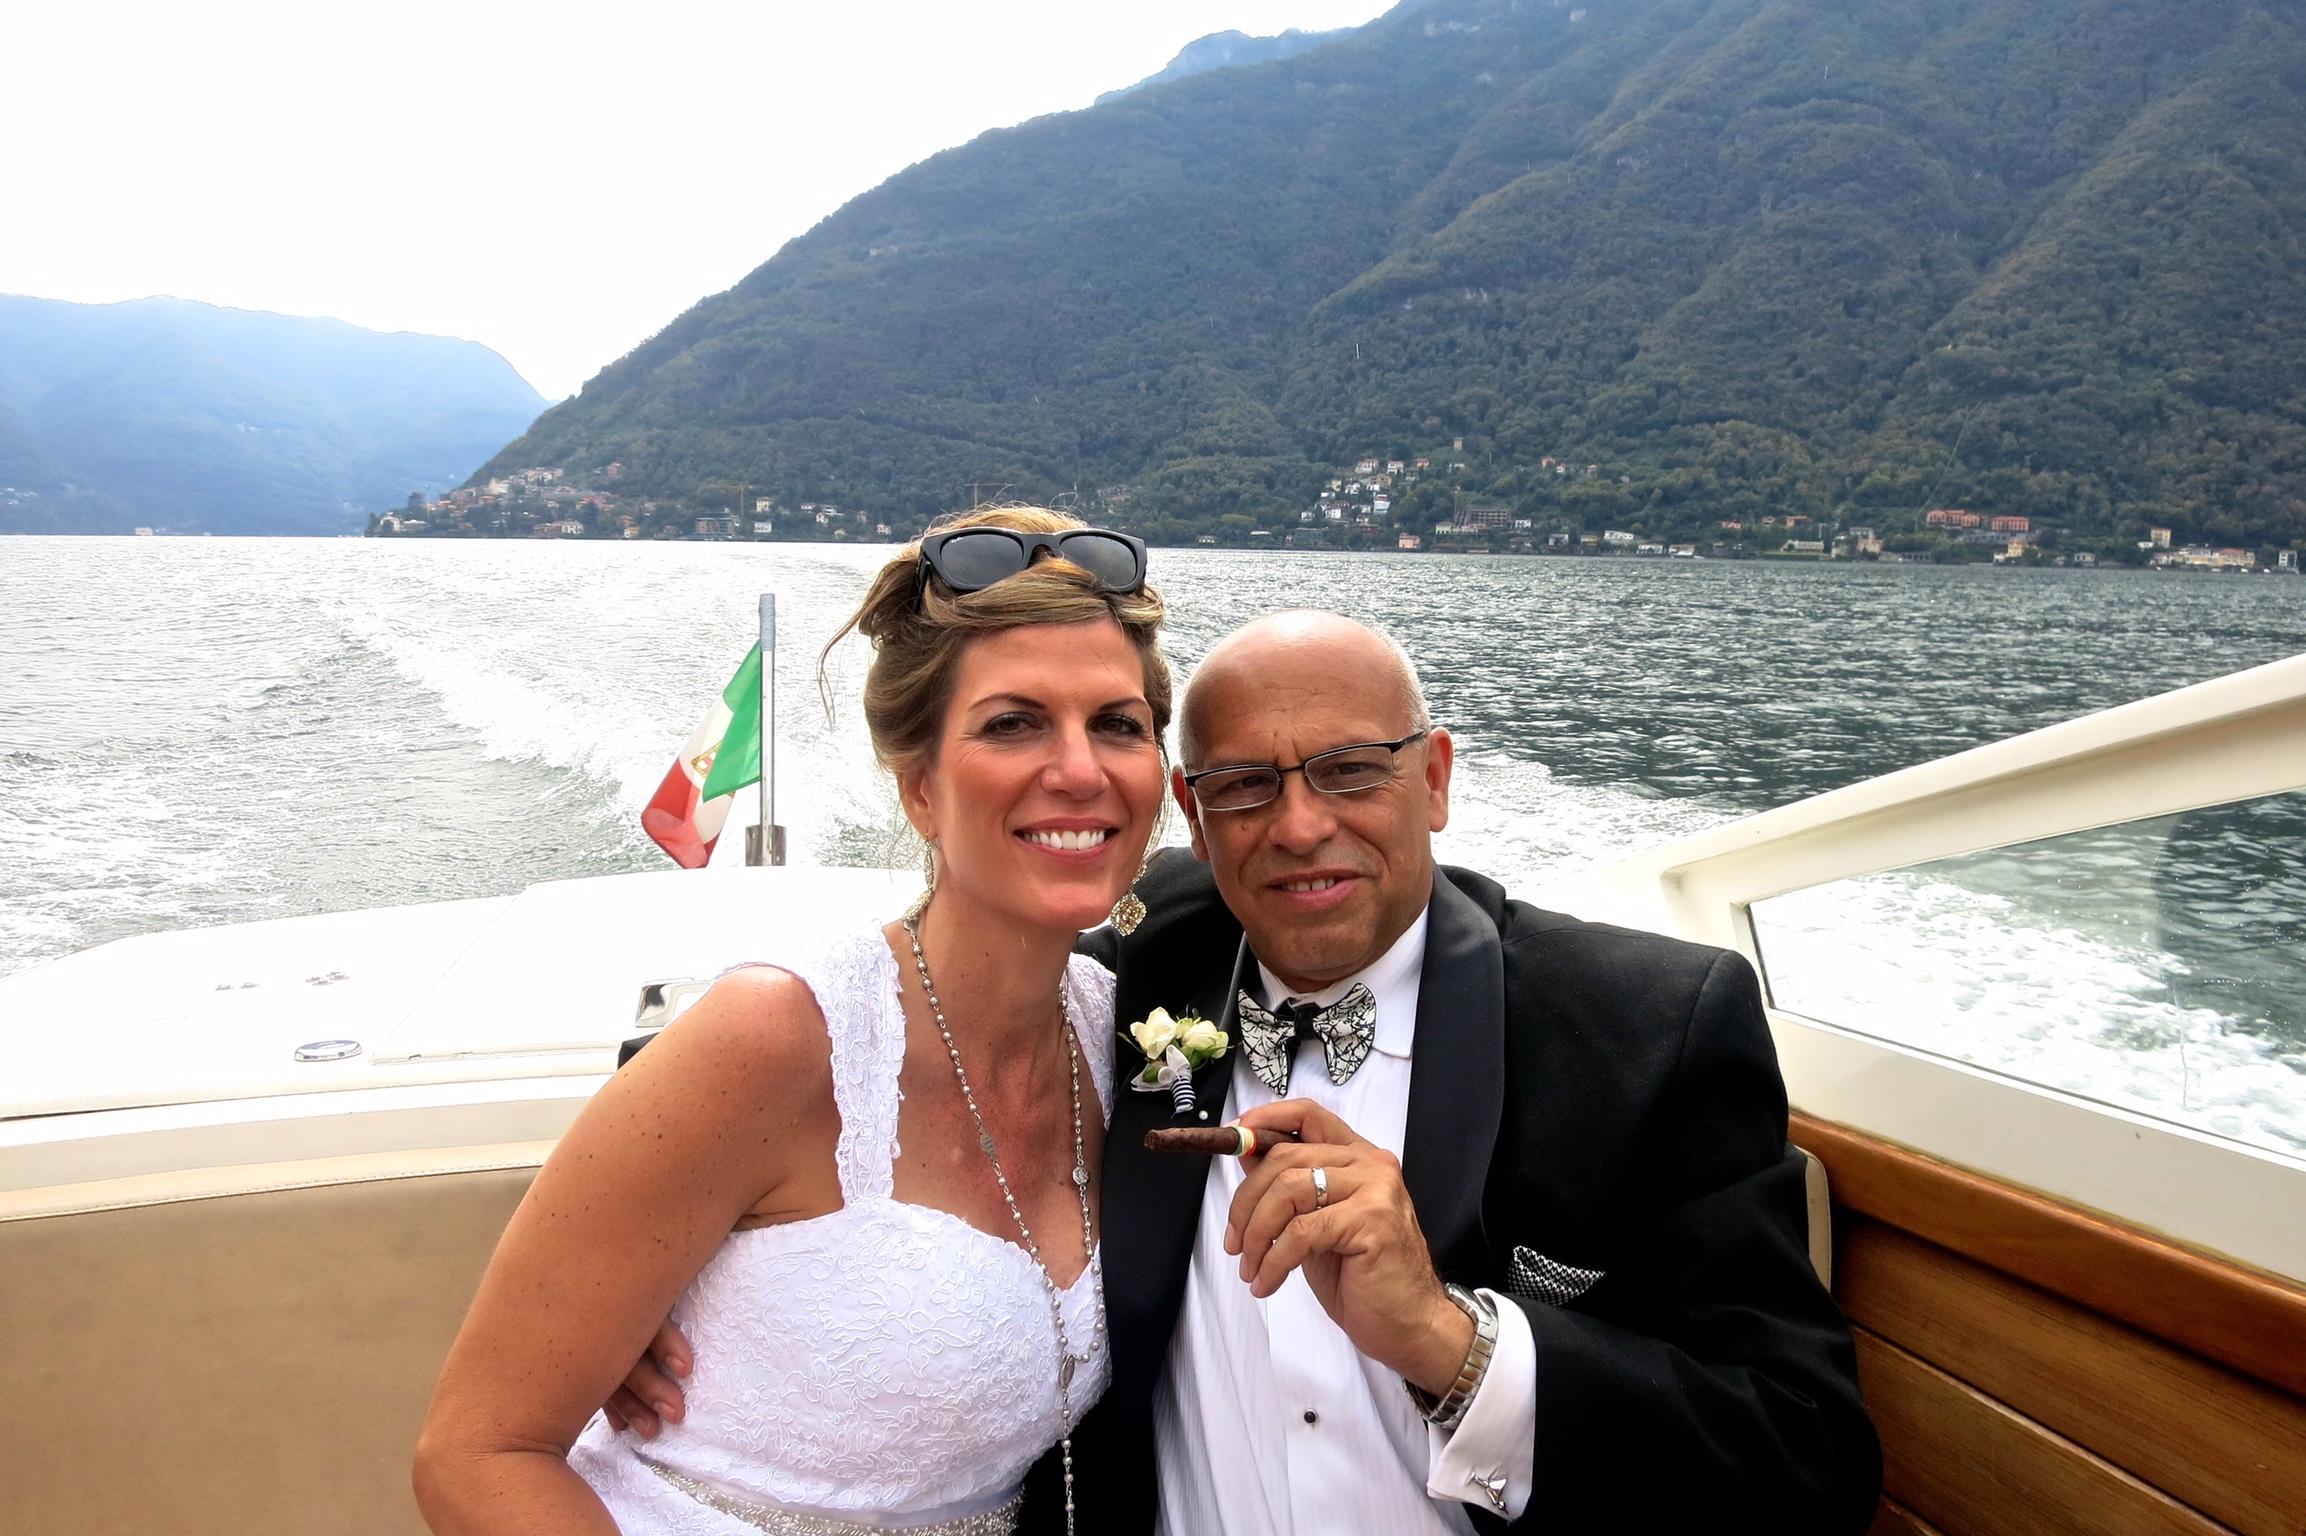 Our wedding day on Lake Como, Italy 2013